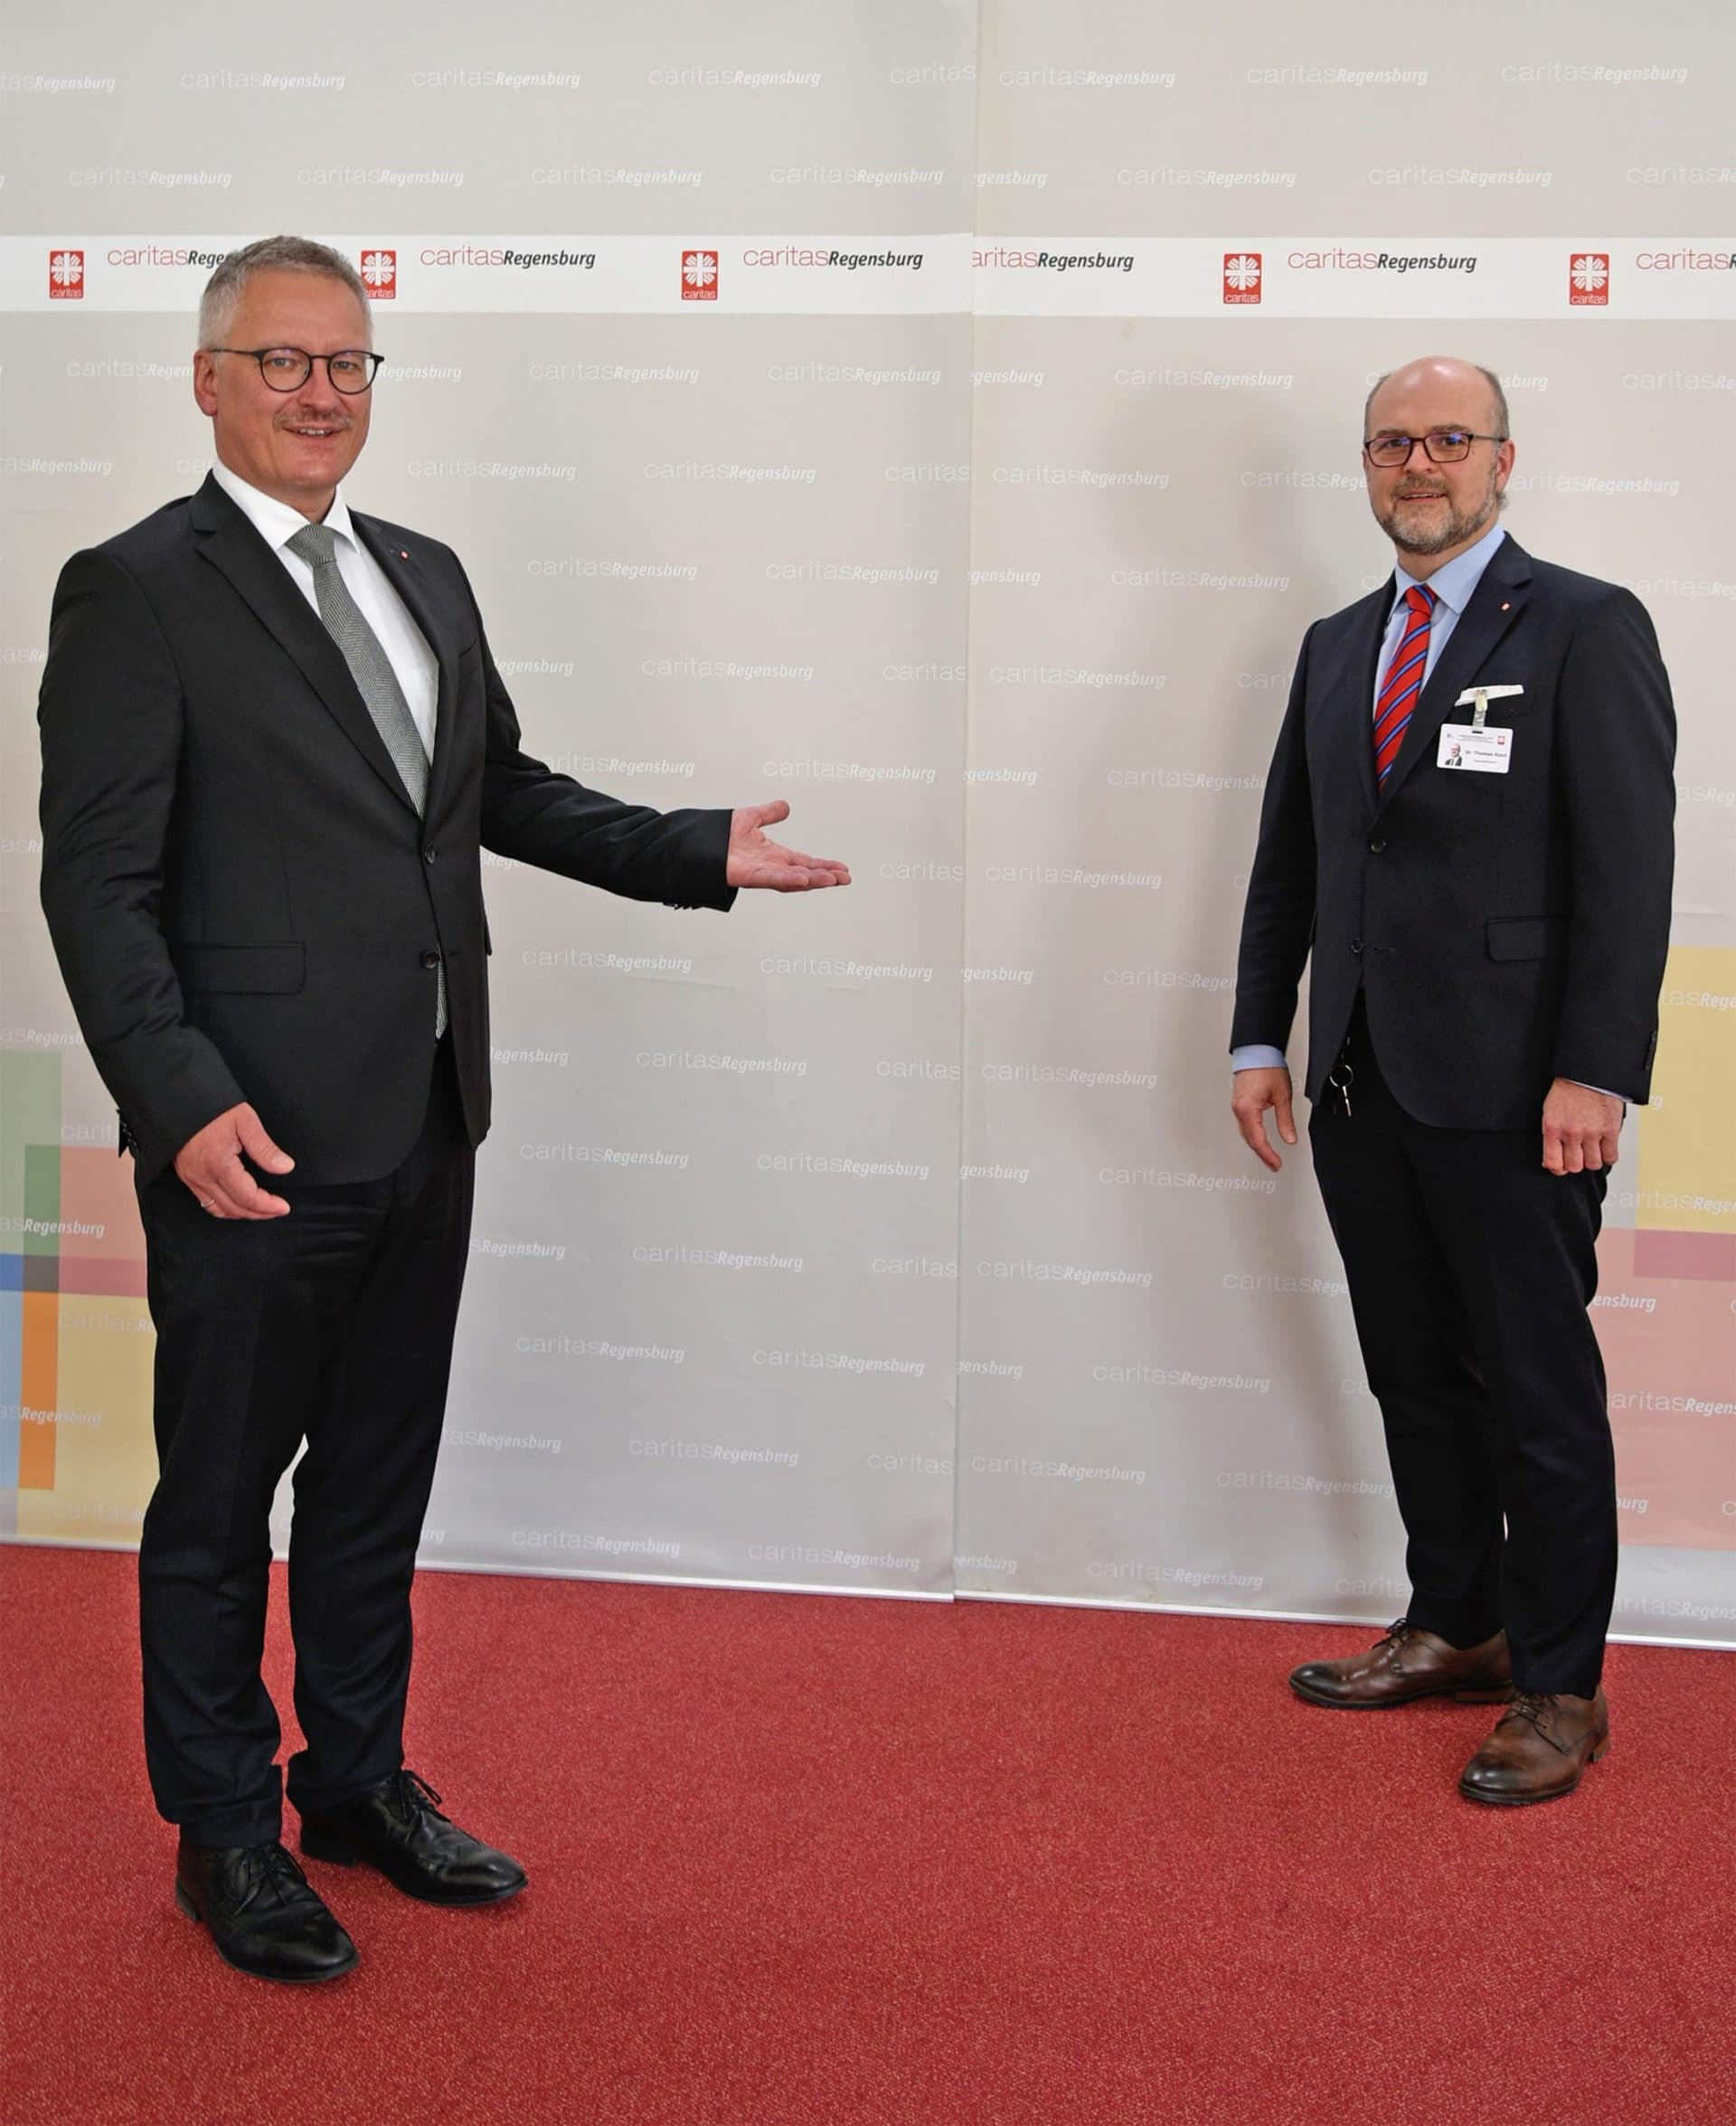 Neuer Geschäftsführer am Caritas-Krankenhaus St. Josef Dr. Thomas Koch tritt neues Amt mitten in der Coronakrise an